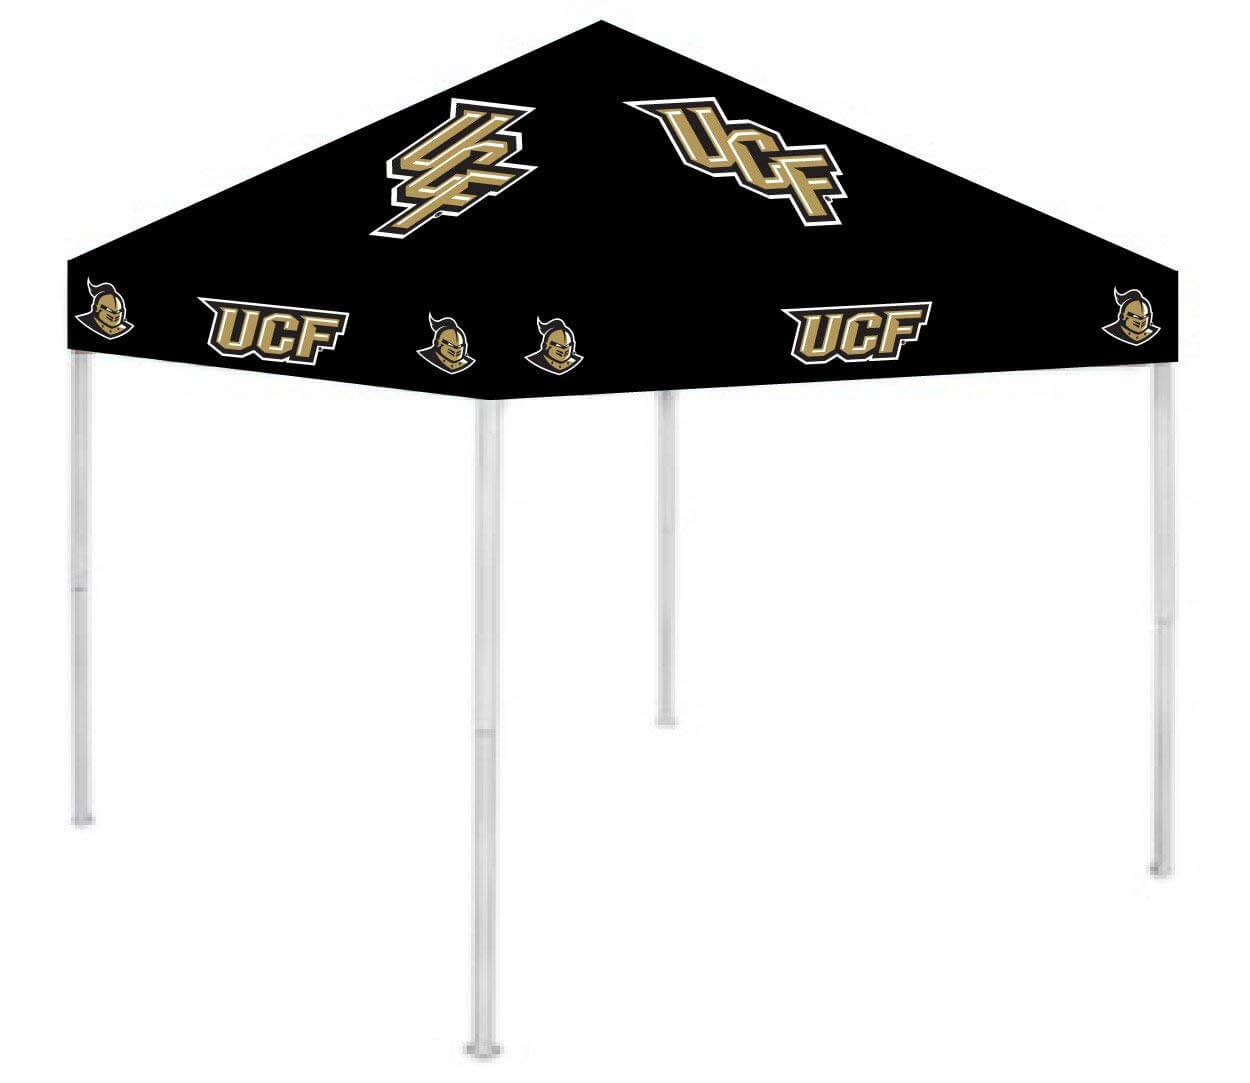 Tailgatecanopytent Ucf Knights Canopy Tent